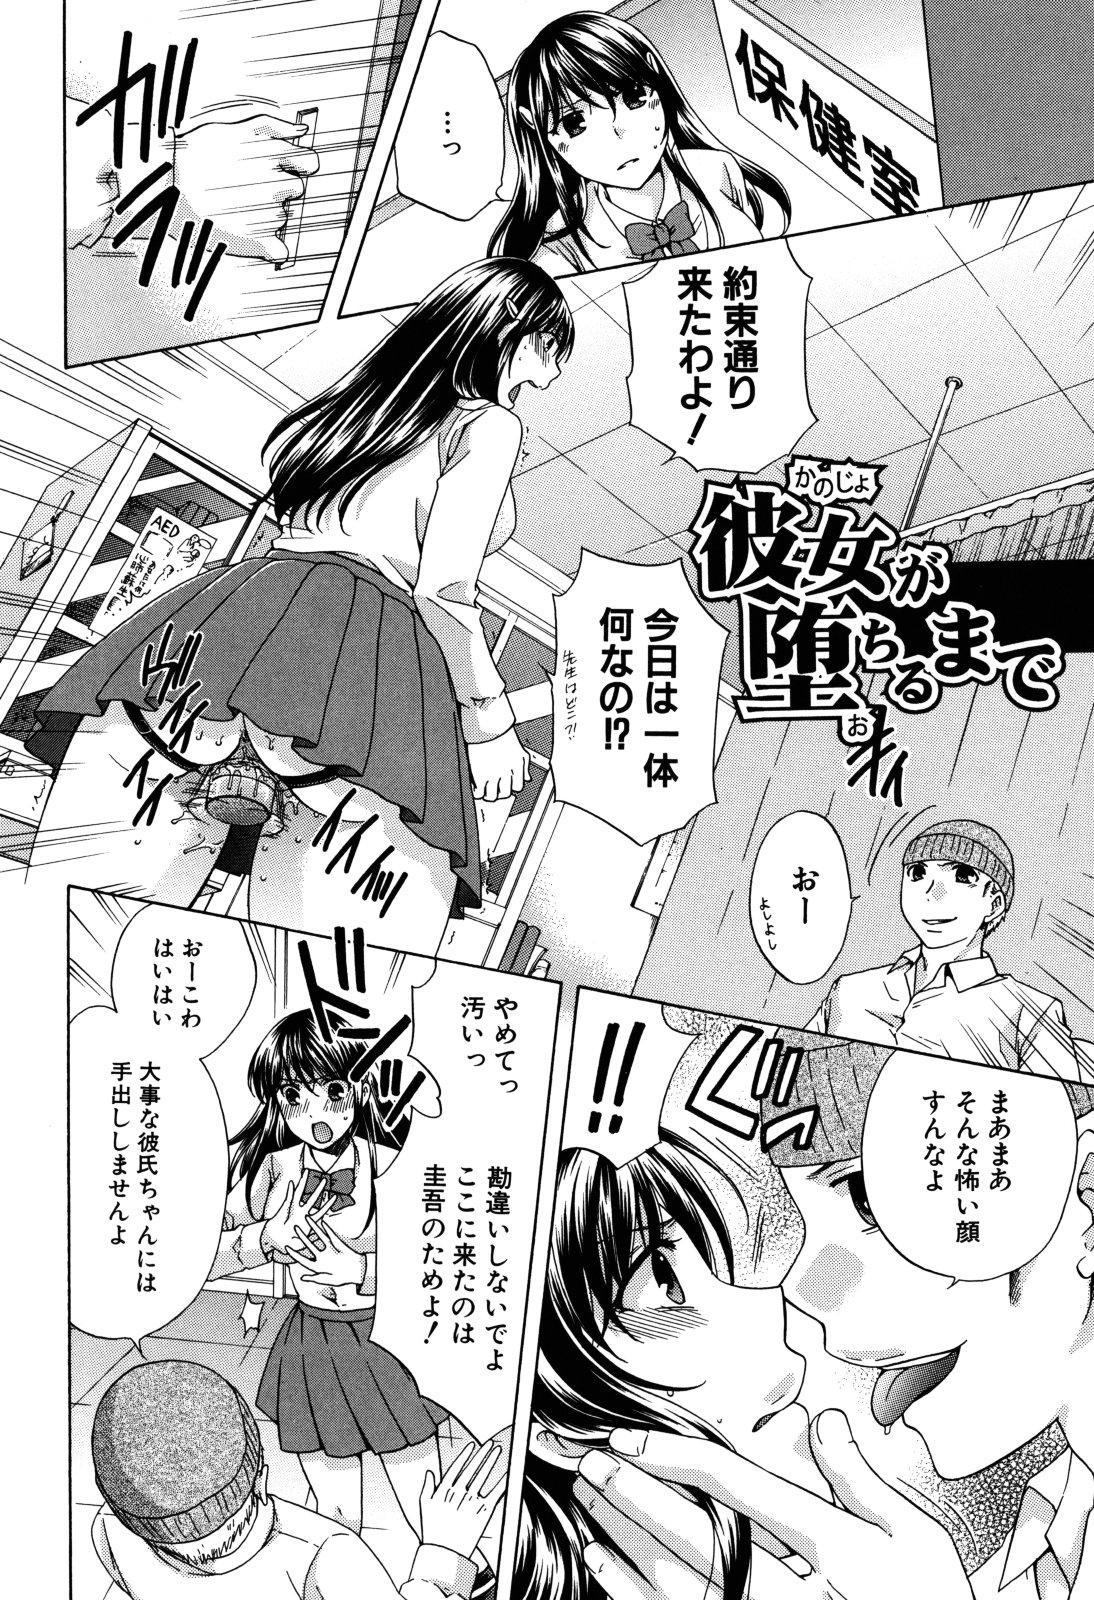 Kanojo ga Ochiru made - She in the depth 187